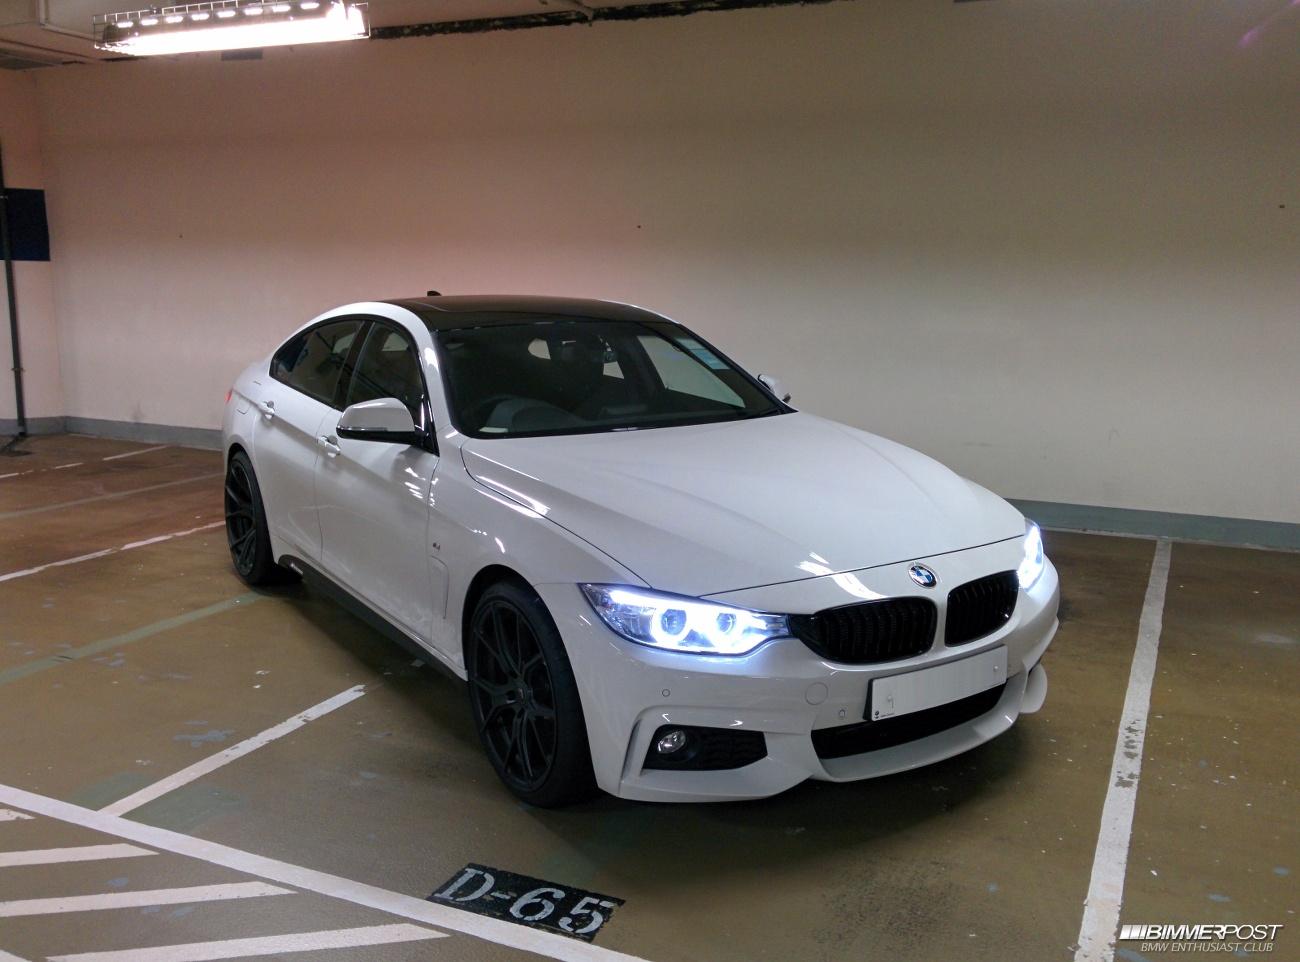 Evssss1 S 2015 Bmw 428i Gran Coupe Bimmerpost Garage